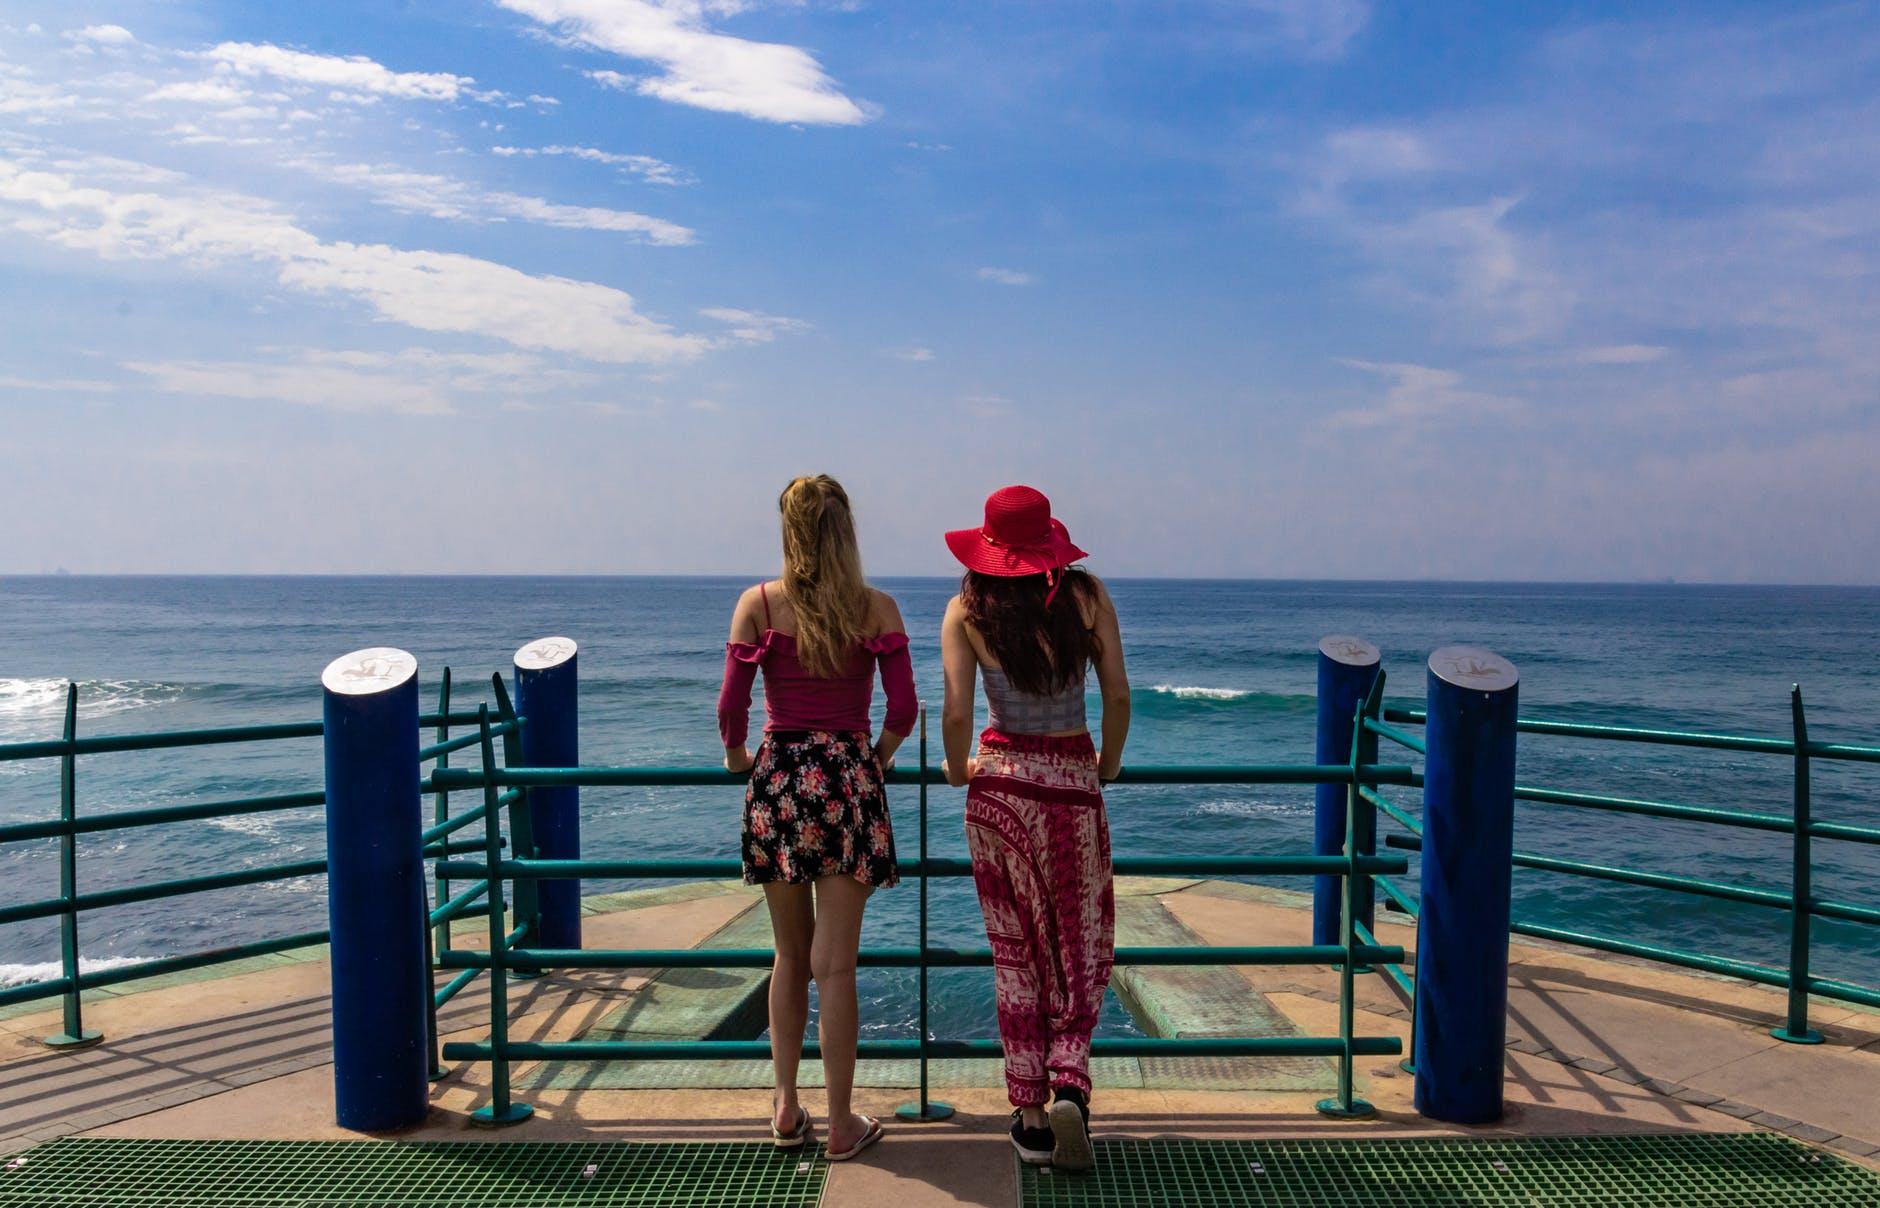 two women in boat looking at ocean